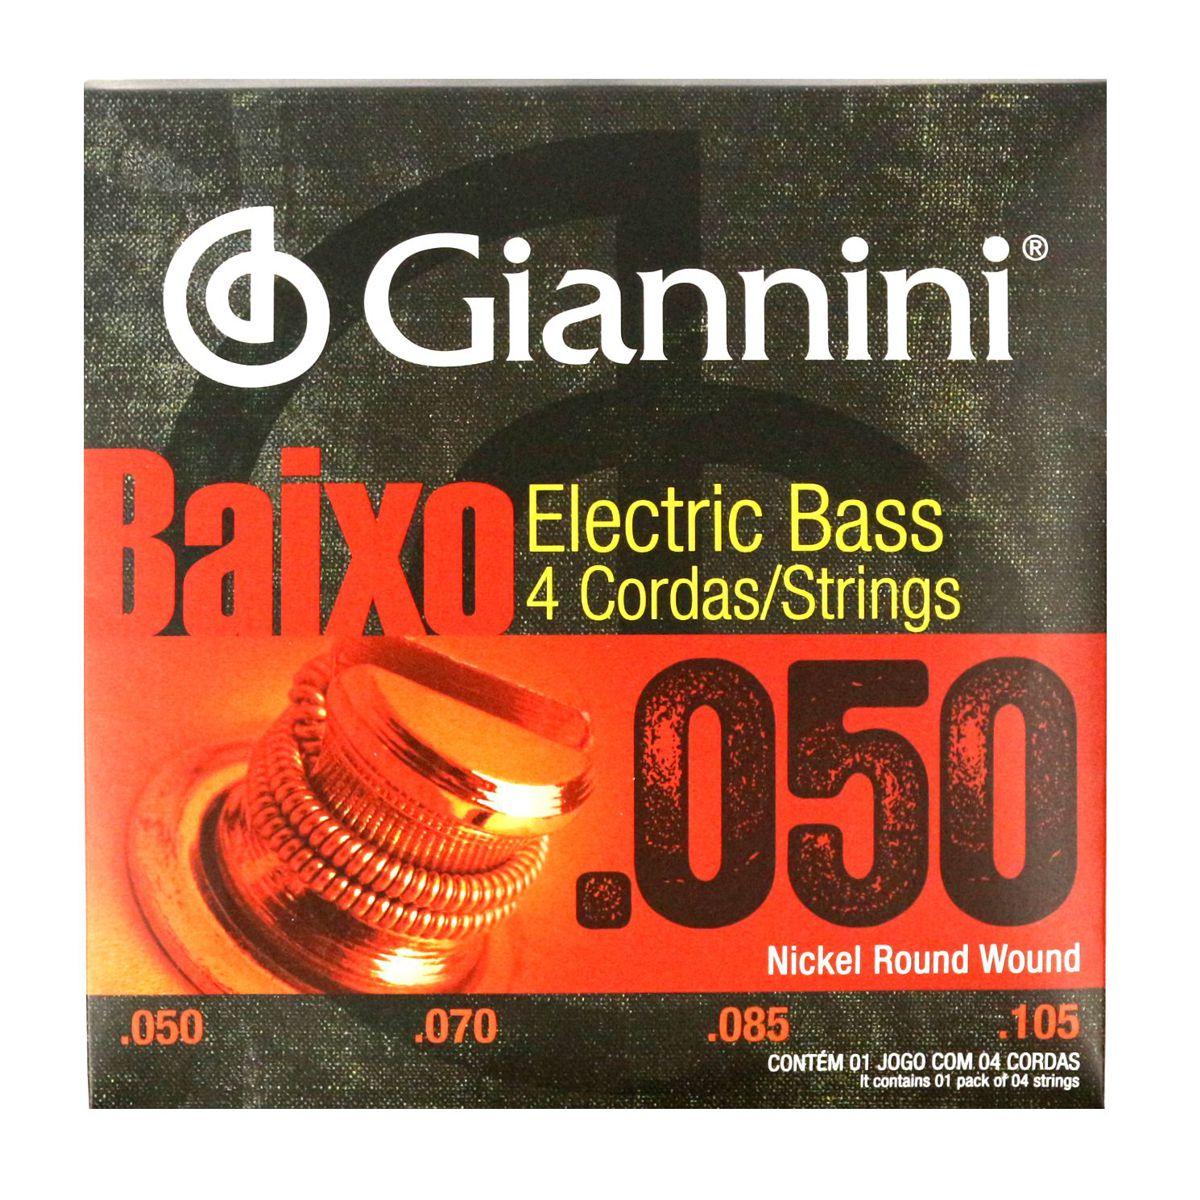 Encordoamento para Contra Baixo Giannini 4 Cordas .050 Nickel Round Wound - Geebsx